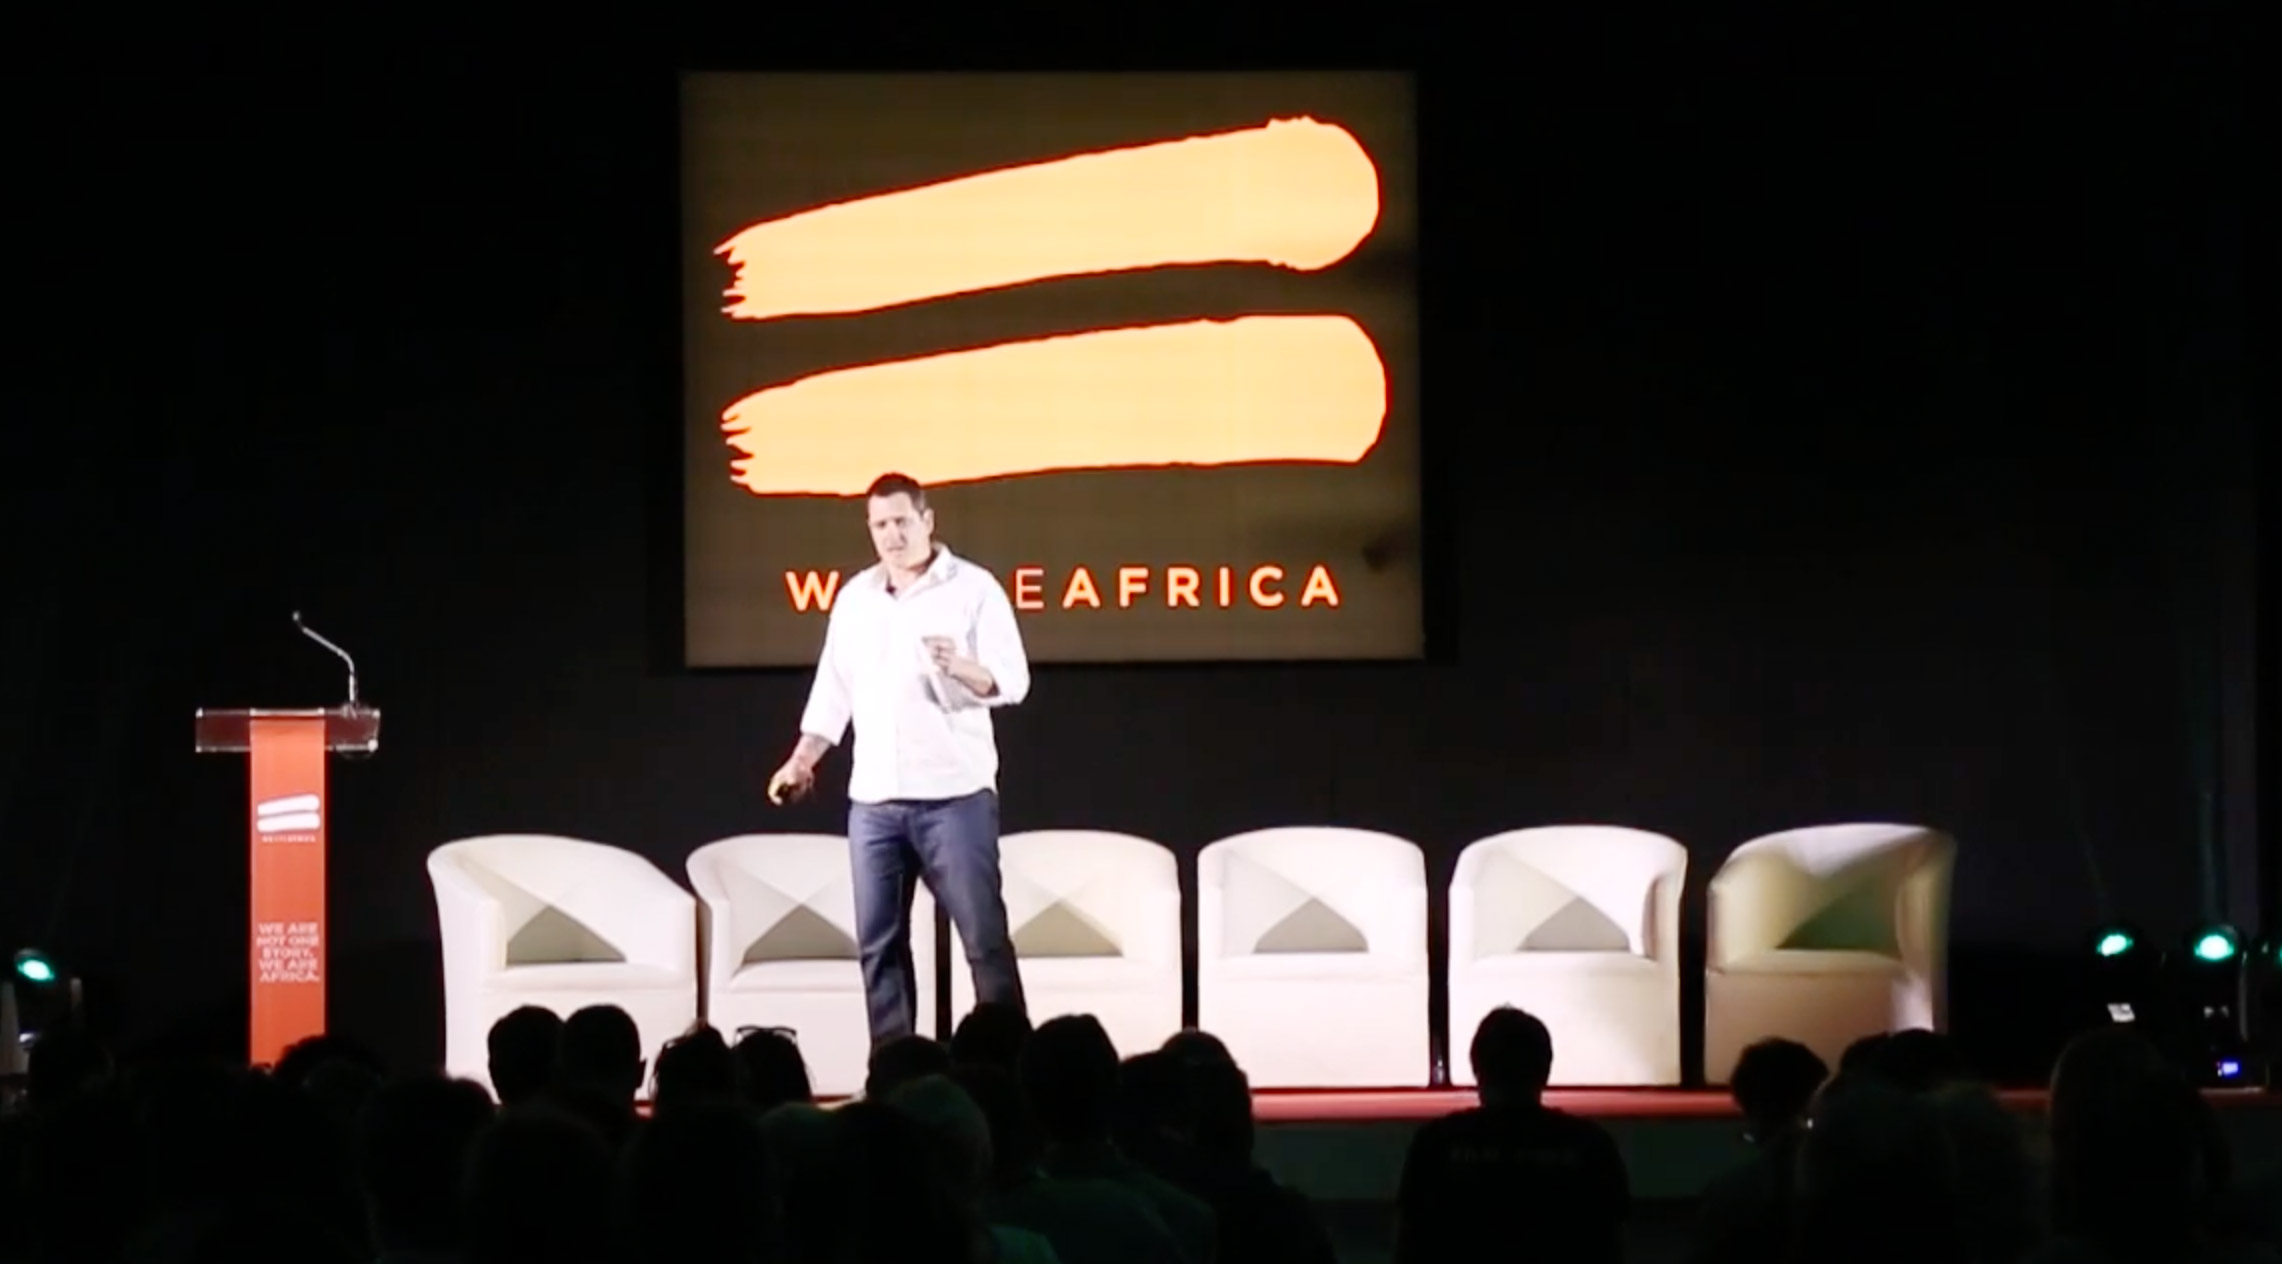 We Are Africa Conservation Lab 2015 - Damien Mander